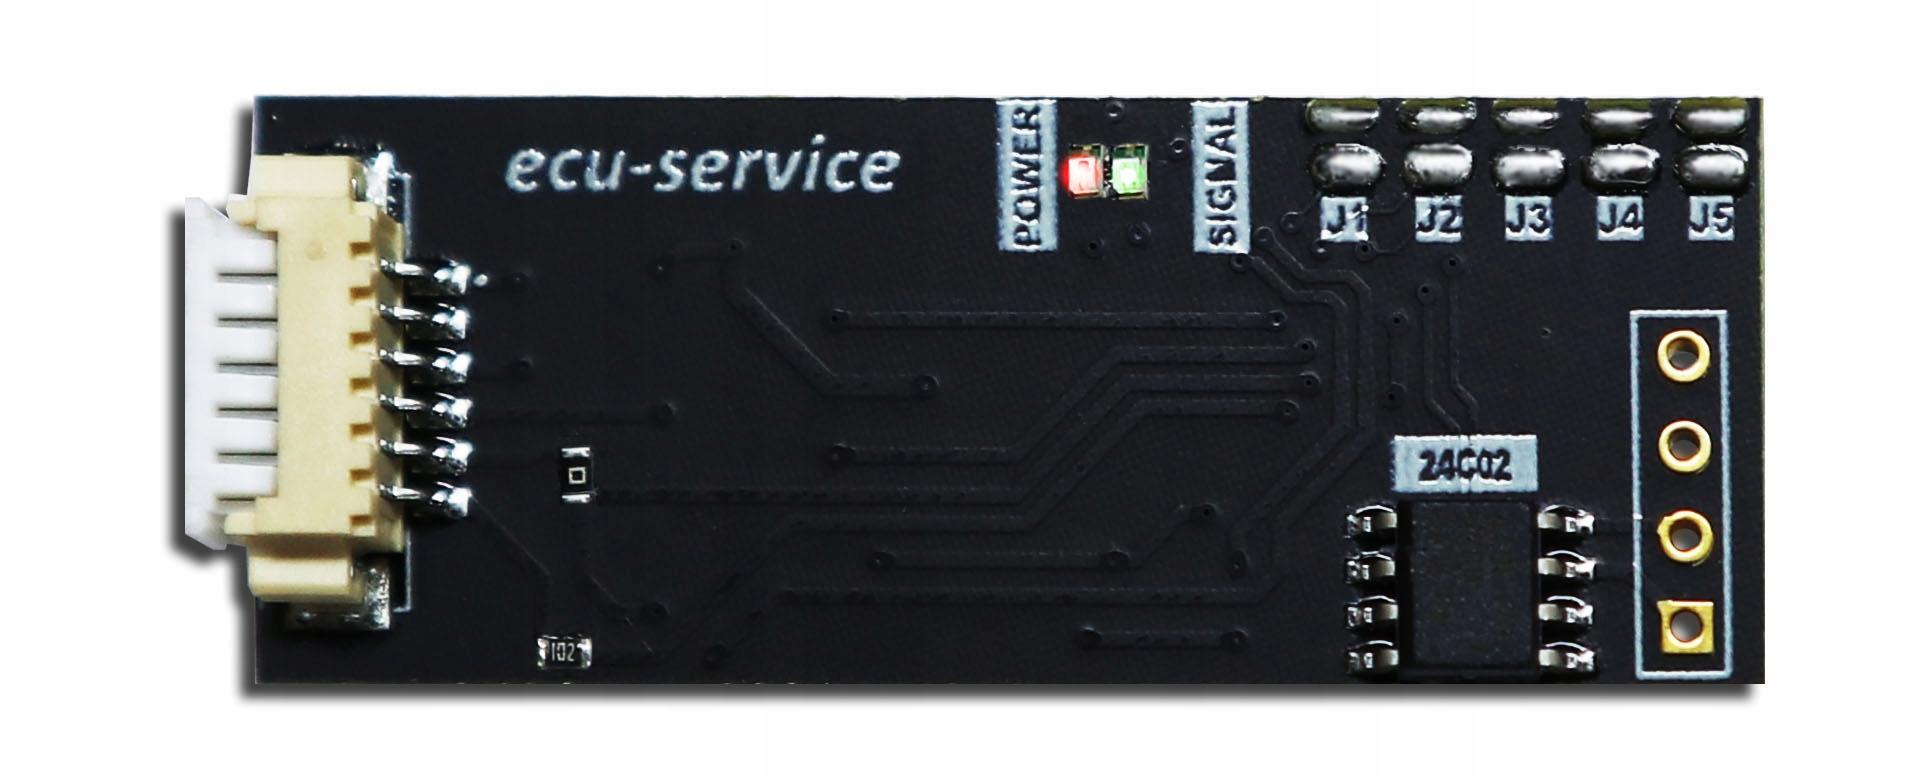 vag иммо 5 эмулятор edc17 med17 me17 dq200 dq250